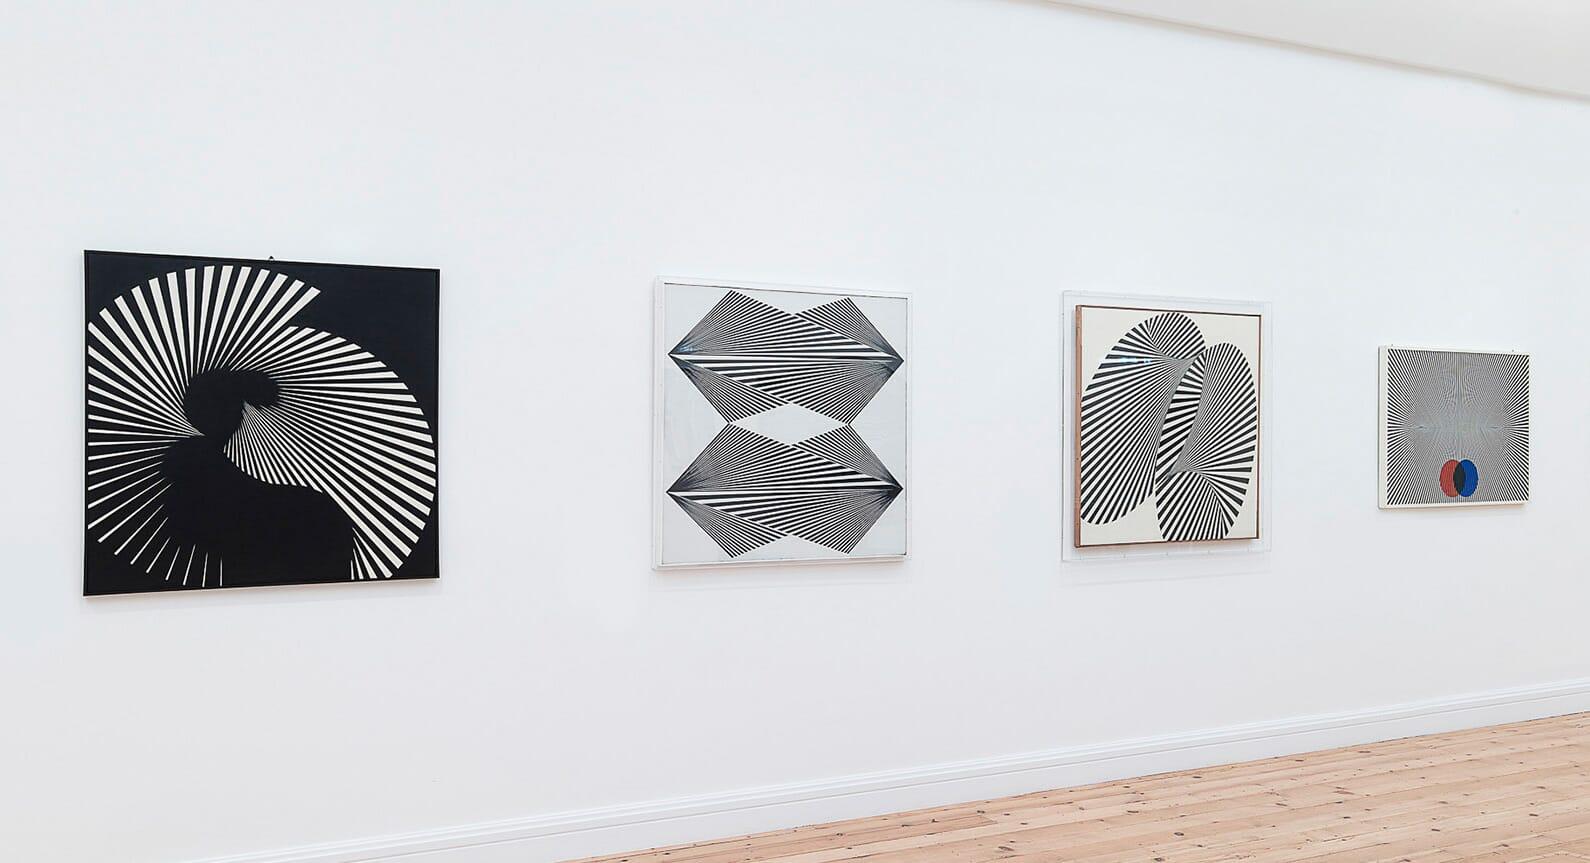 Graphic Design and Optical Illusions Collide in Franco Grignani Exhibit